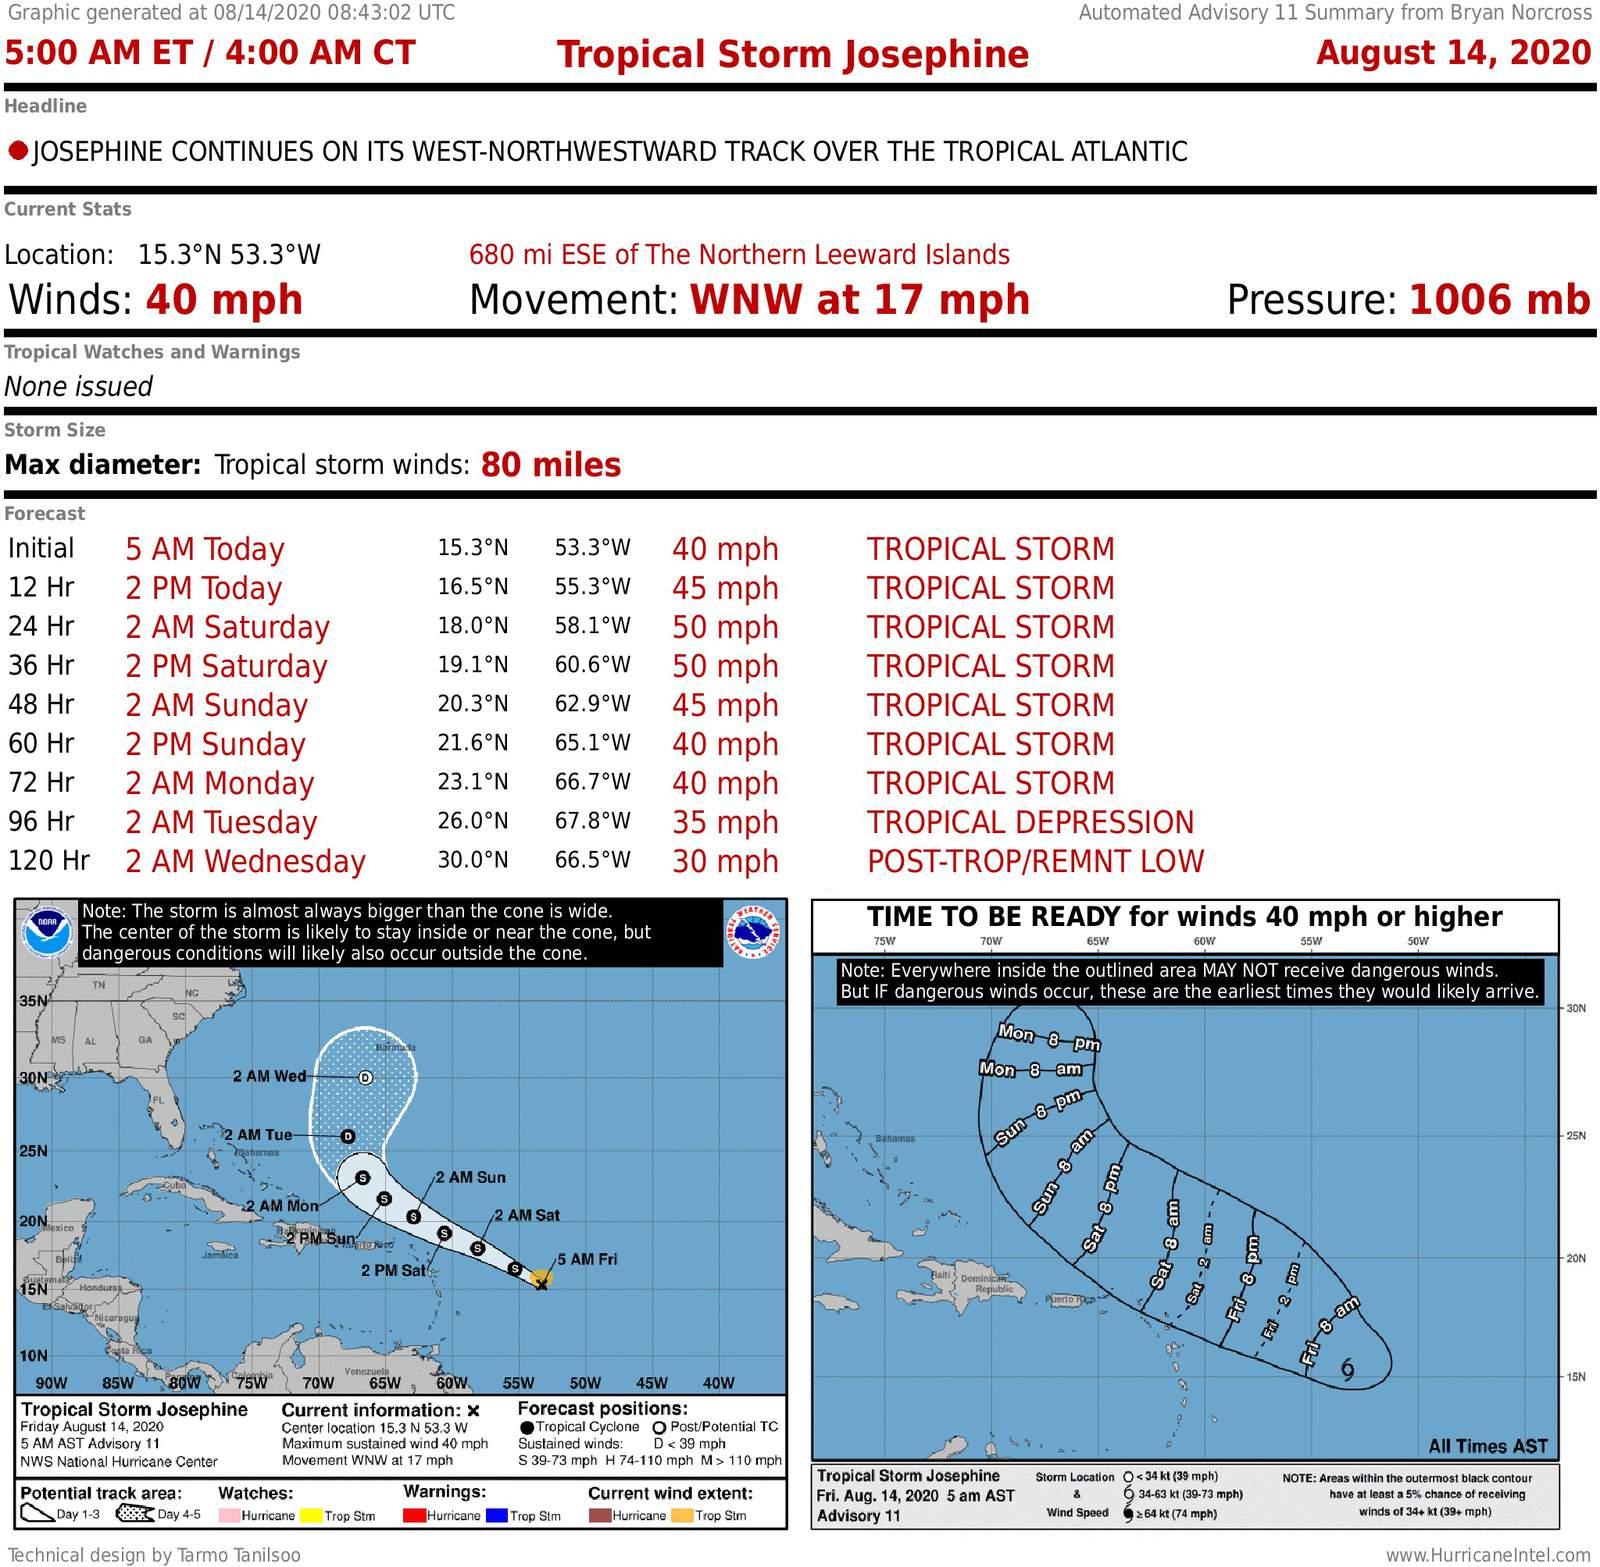 Tropical Storm Josephine Is Struggling While The Tropics Go Eerily Quiet